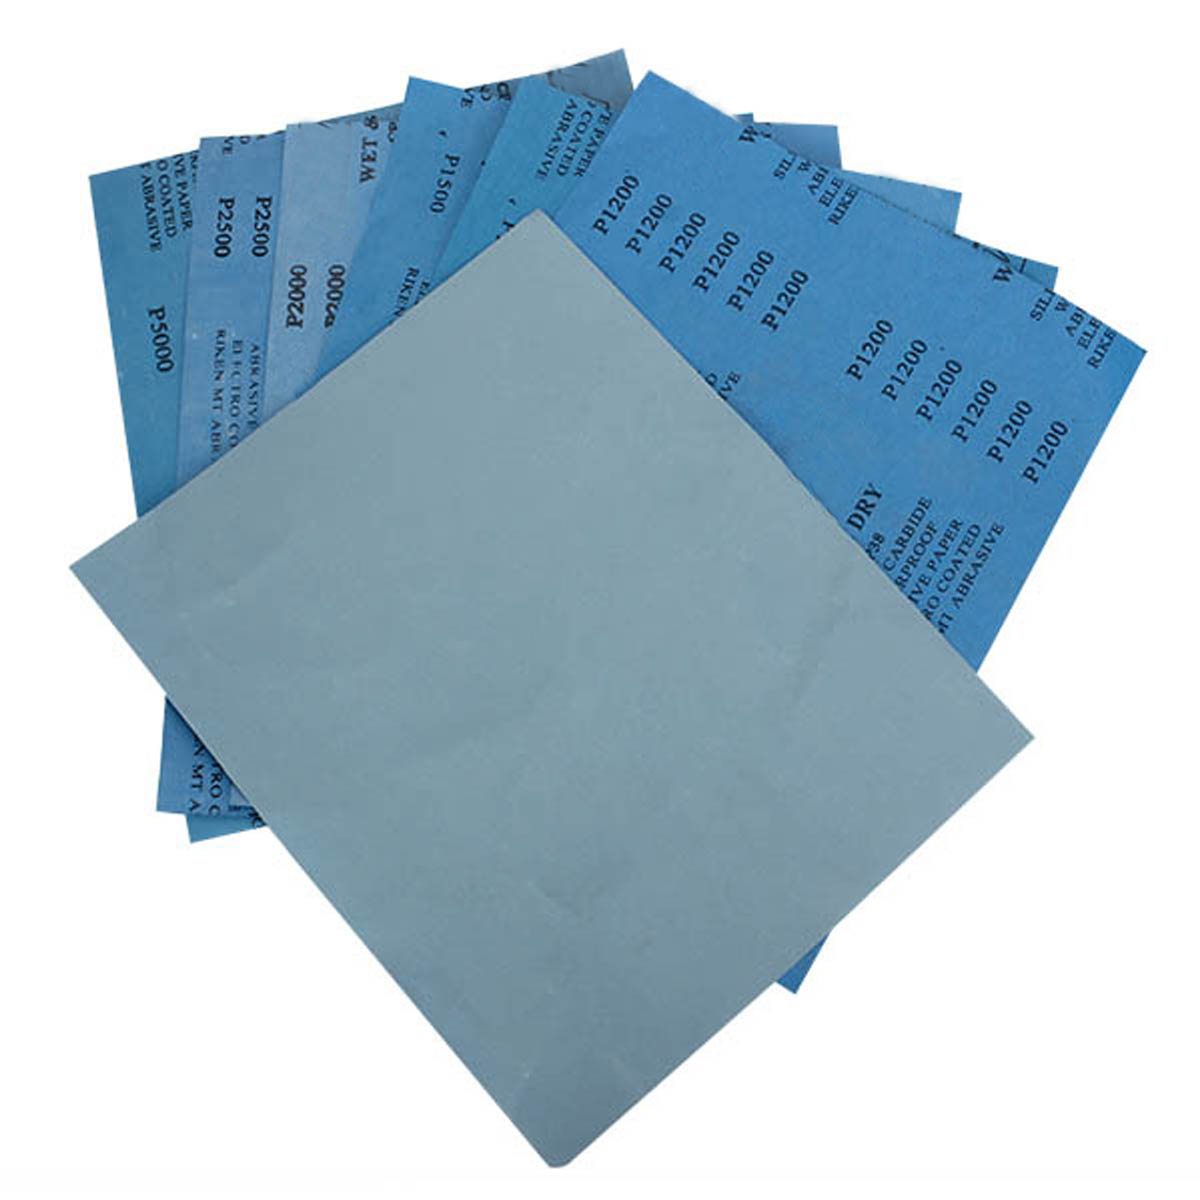 2pcs of ech Grit 1500 2000 2500 3000 5000 7000 Sanding sheet Grit 1500 to 7000 Wet//dry Sandpaper Sheets Precision Polishing Sanding